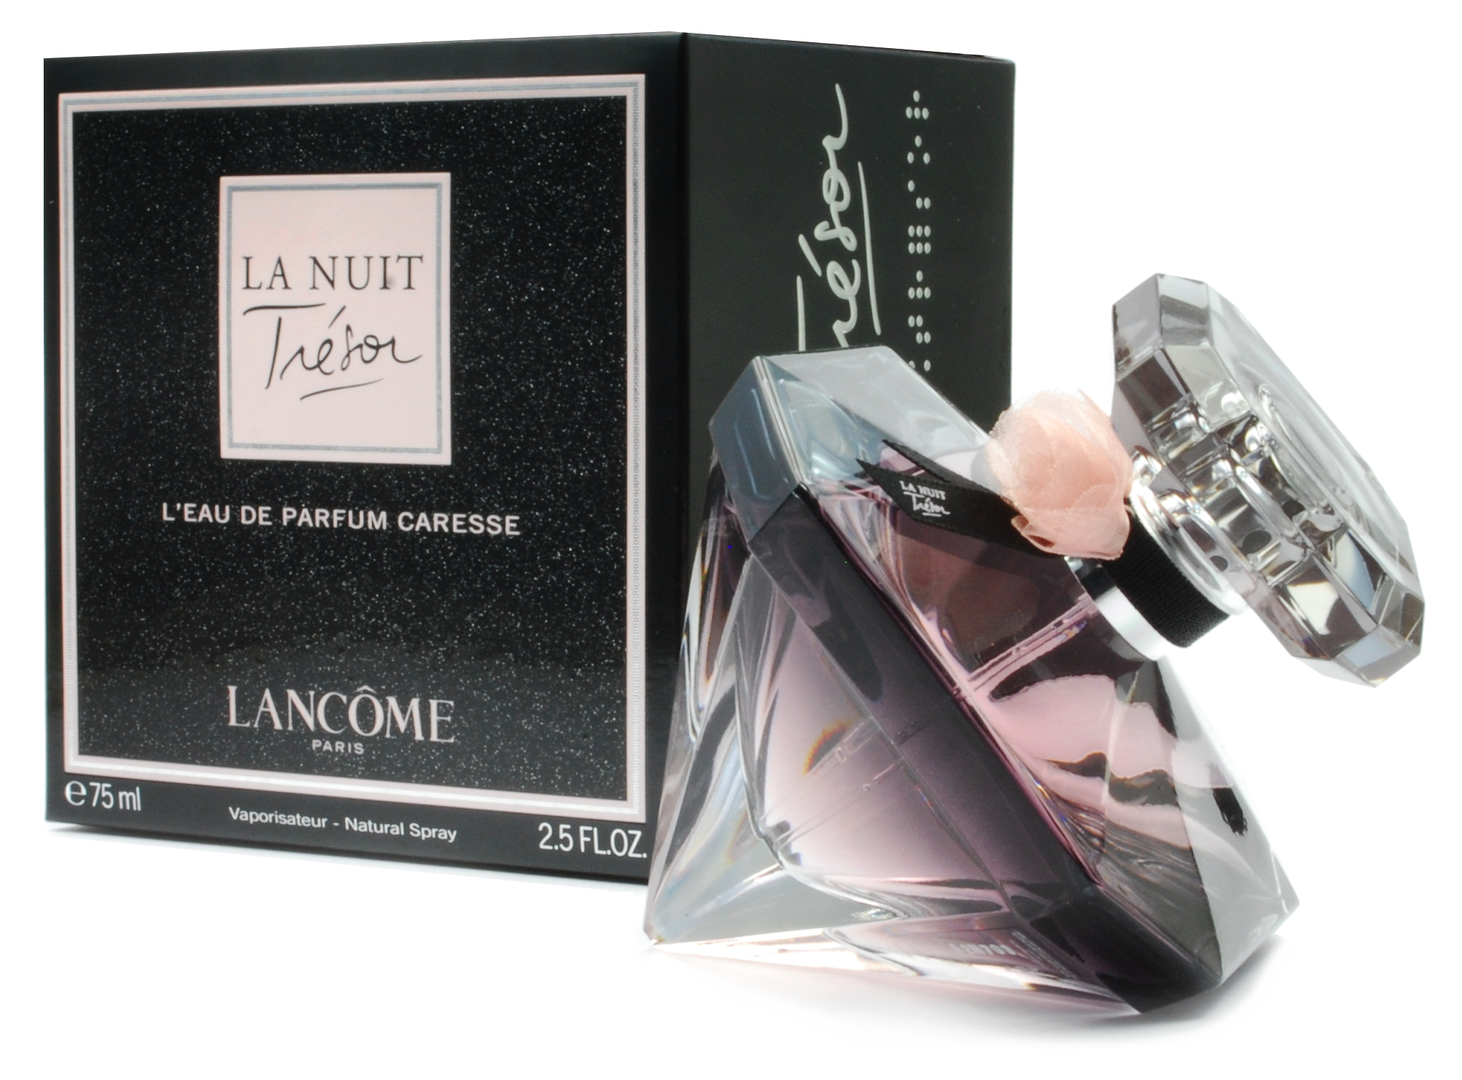 Lancome Tresor La Nuit L´Eau De Parfum Caresse, Parfémovaná voda, 75ml, Dámska vôňa, + AKCE: dárek zdarma